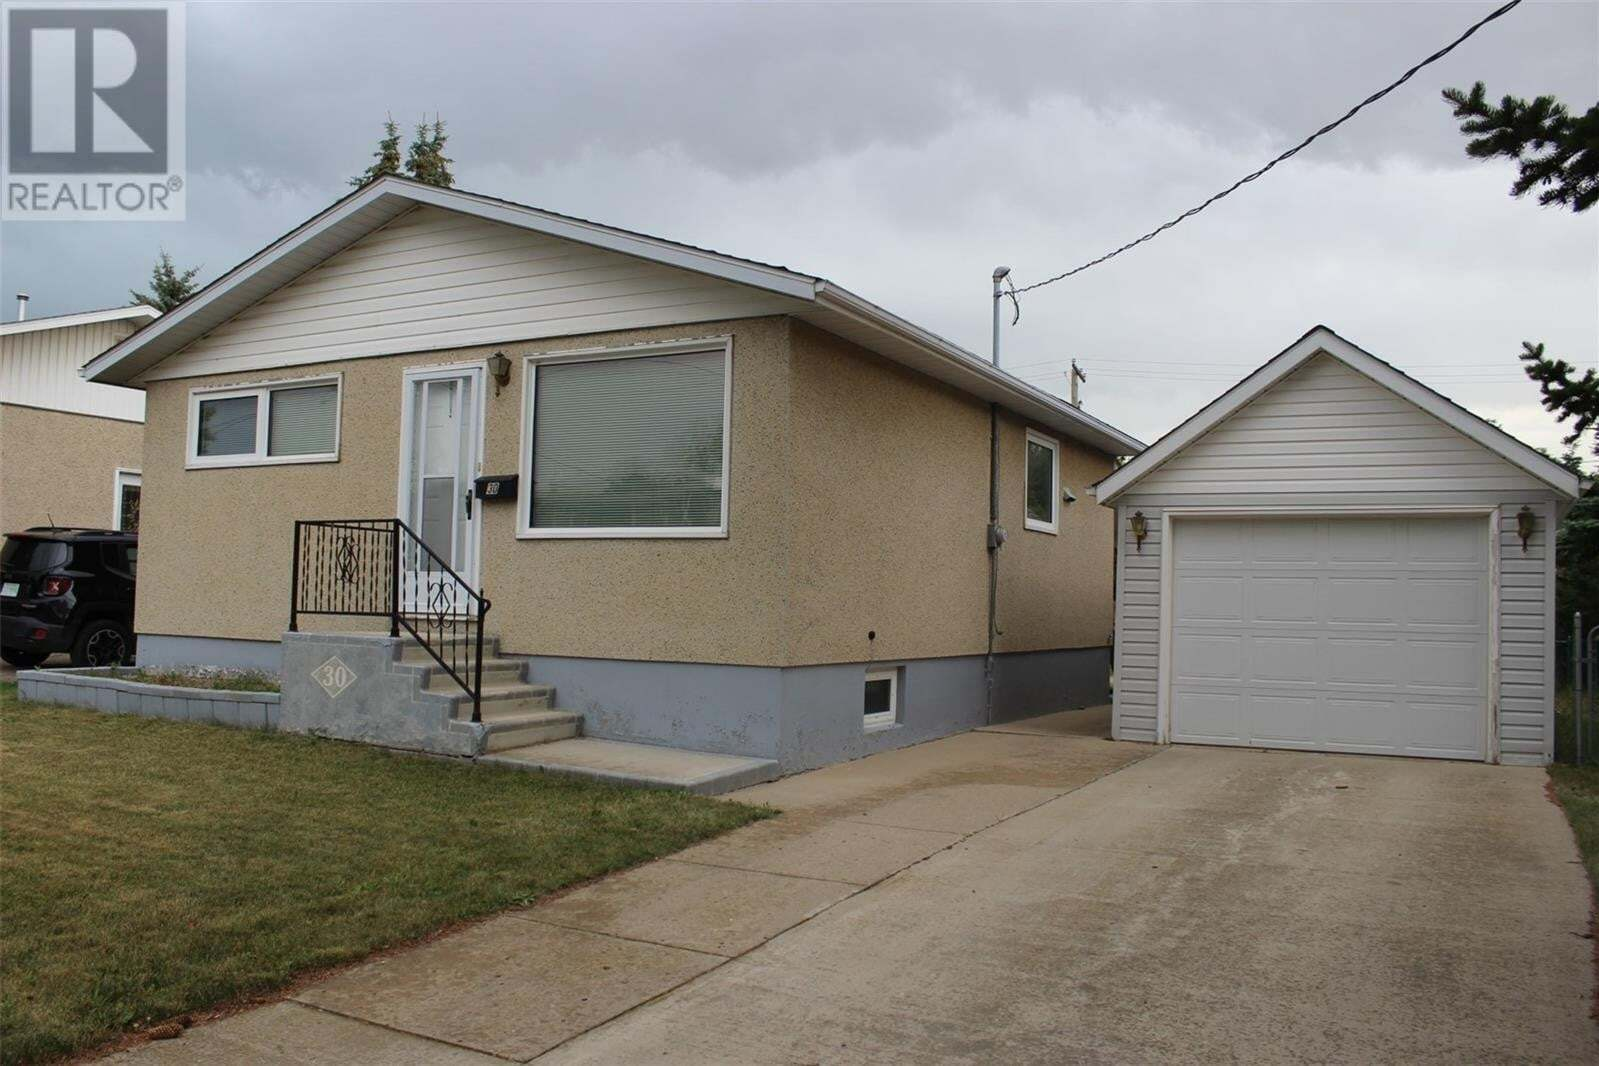 House for sale at 30 7th St Weyburn Saskatchewan - MLS: SK821559